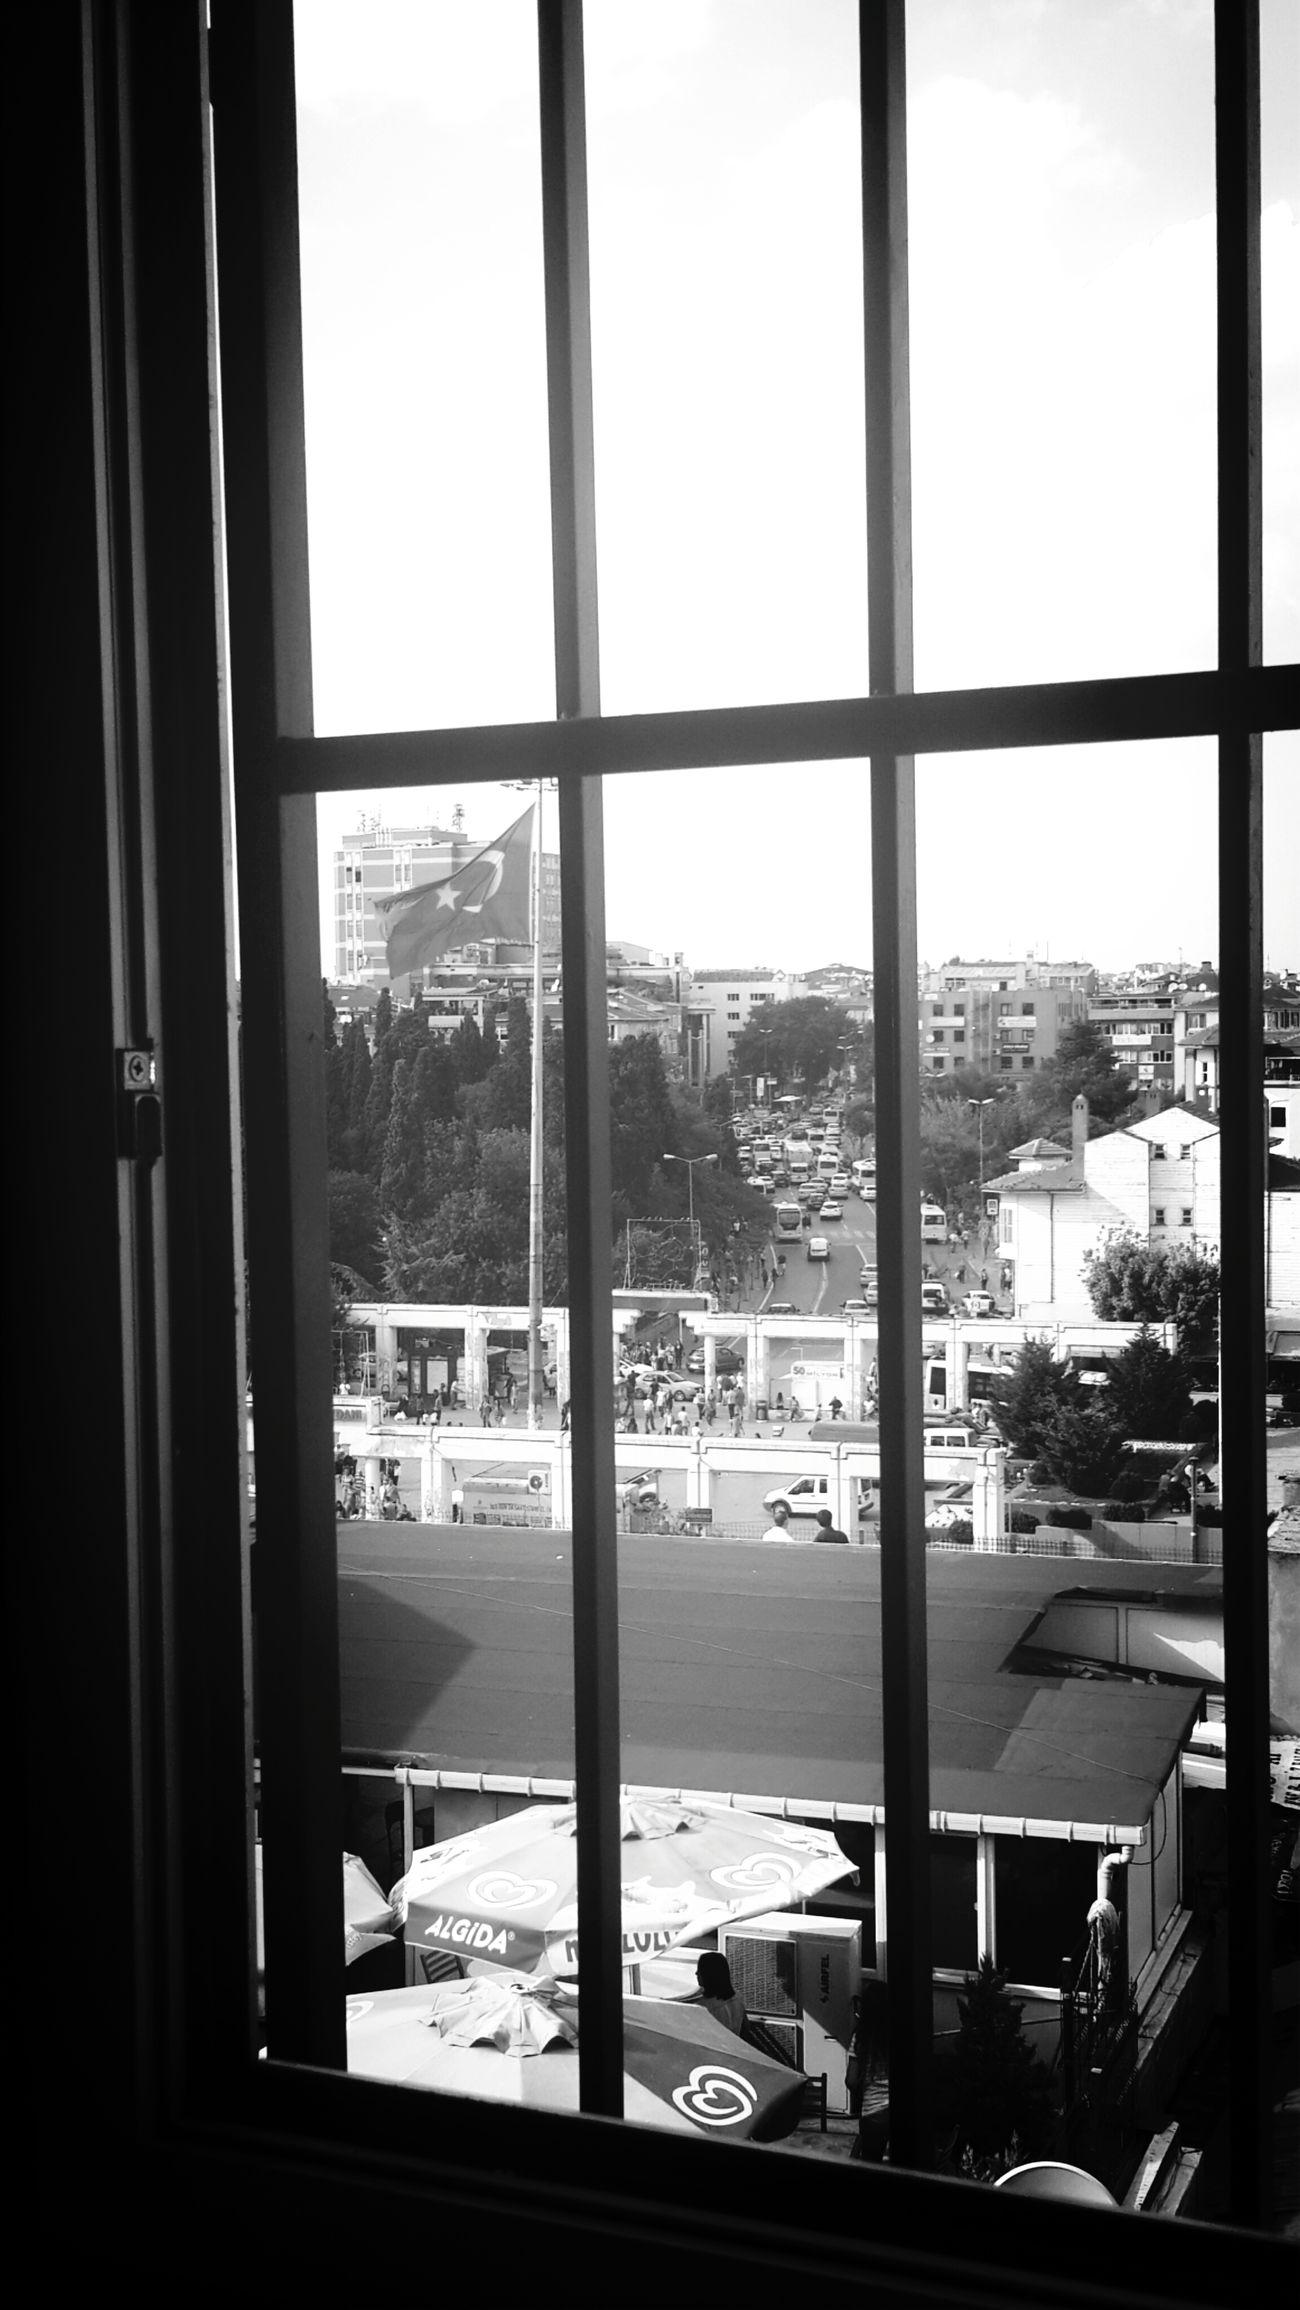 Parmakliklar arasindan bakirkoy meydani Blac&white